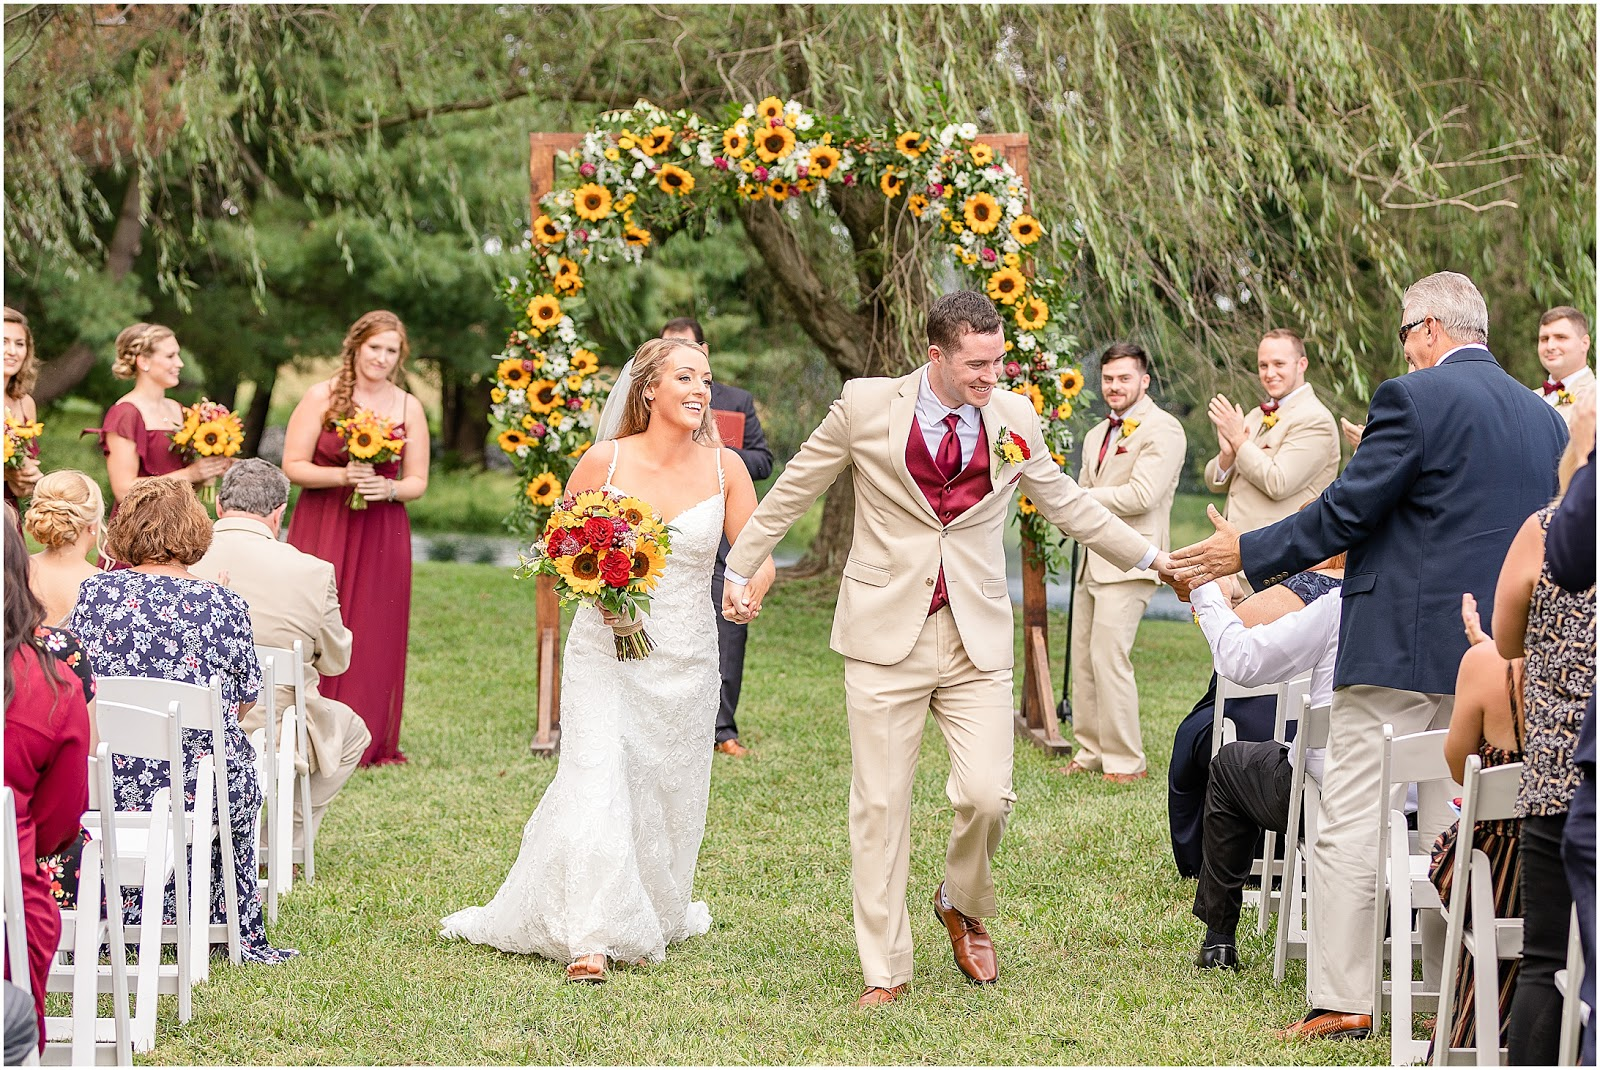 Westminster Wedding Venues for Farm-Loving Couples   Venue ...